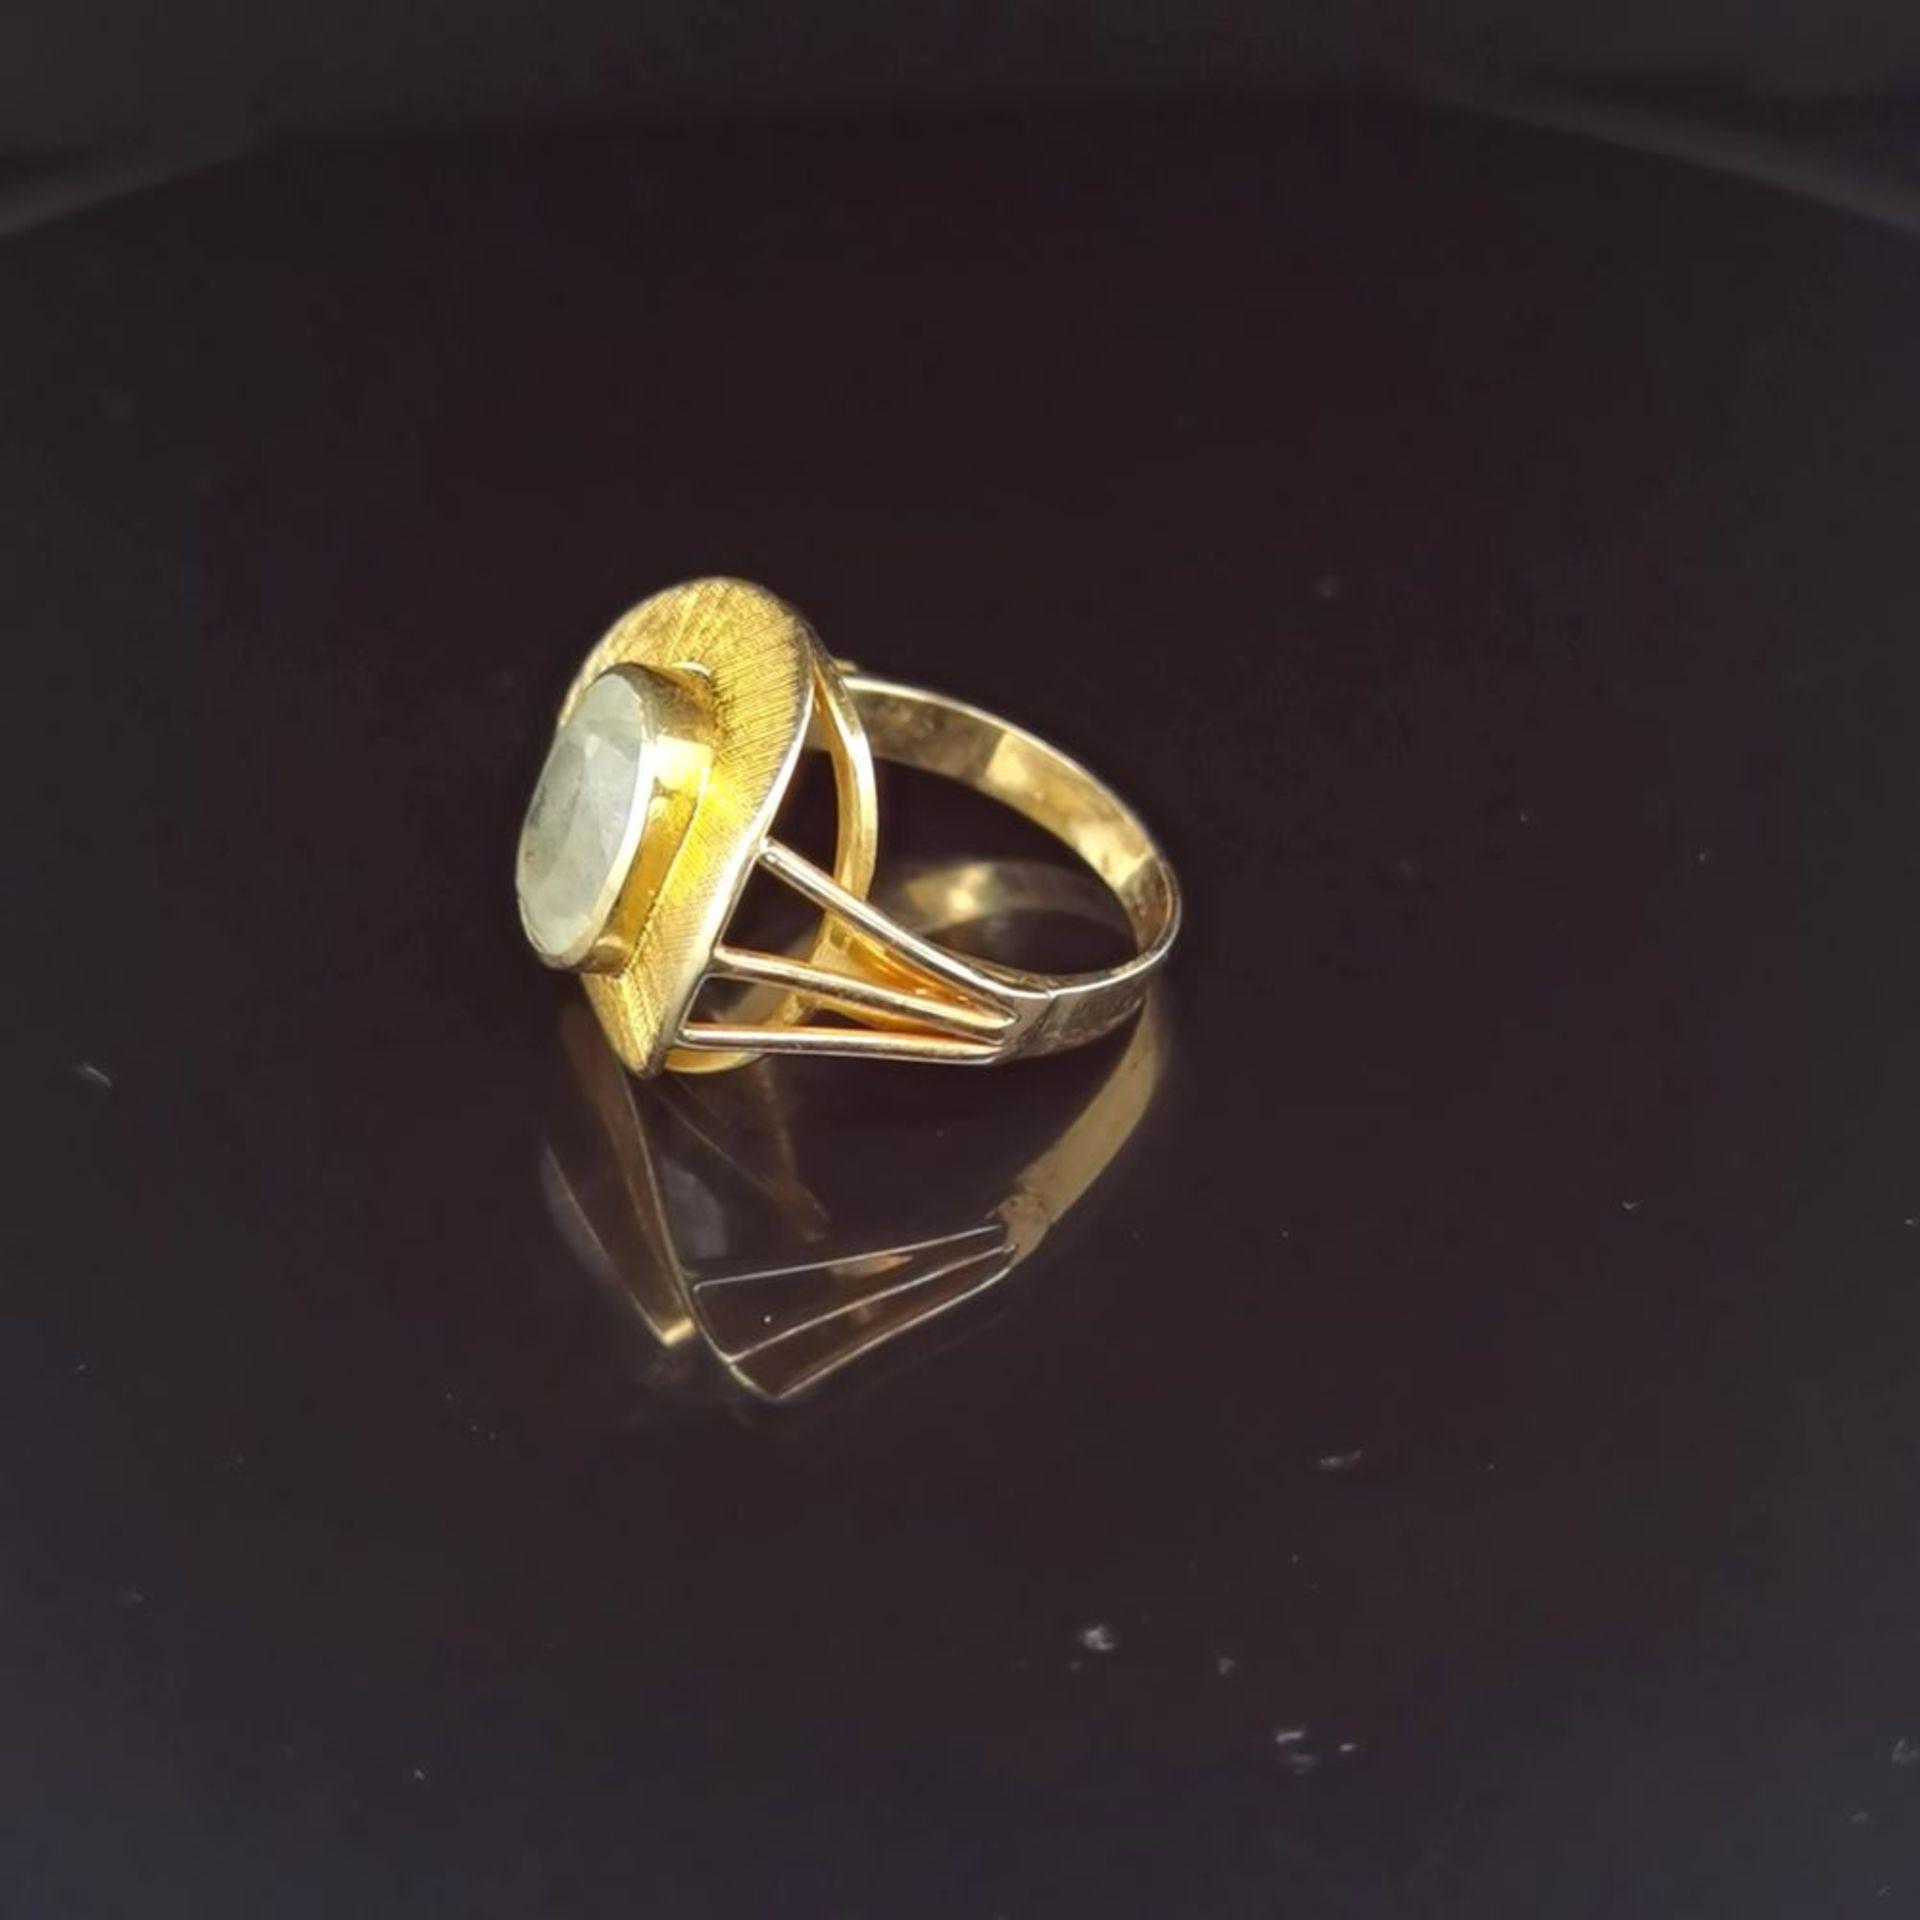 Aquamarin-Ring, 585 Gelbgold 5,7 - Image 2 of 3